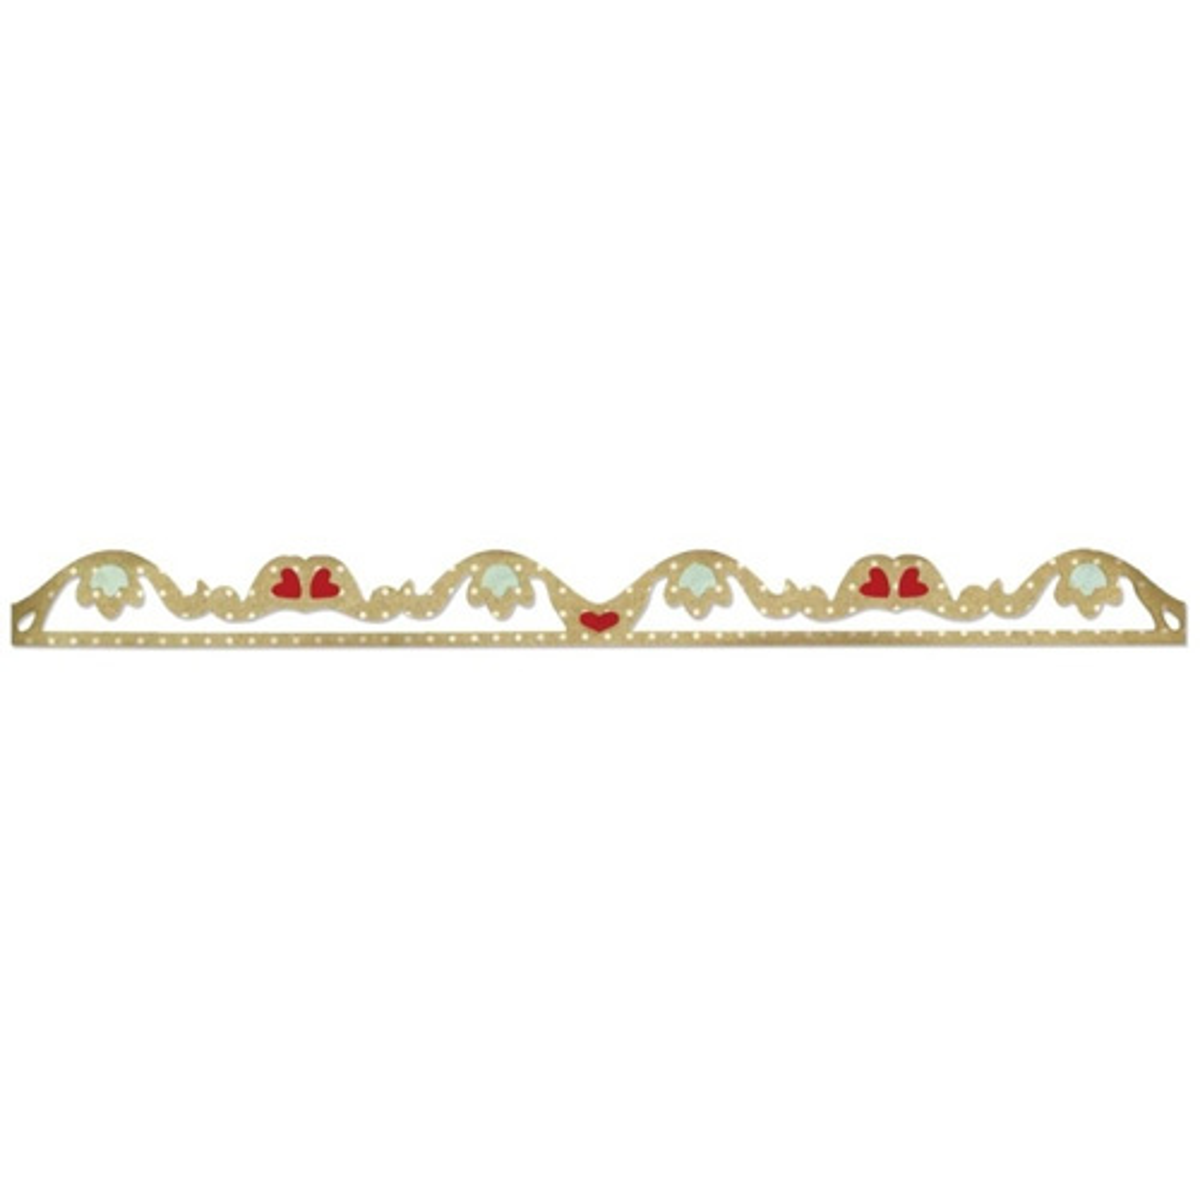 658921 Форма для вырубки Романтические рюши Sizzlits Decorative Strip Die